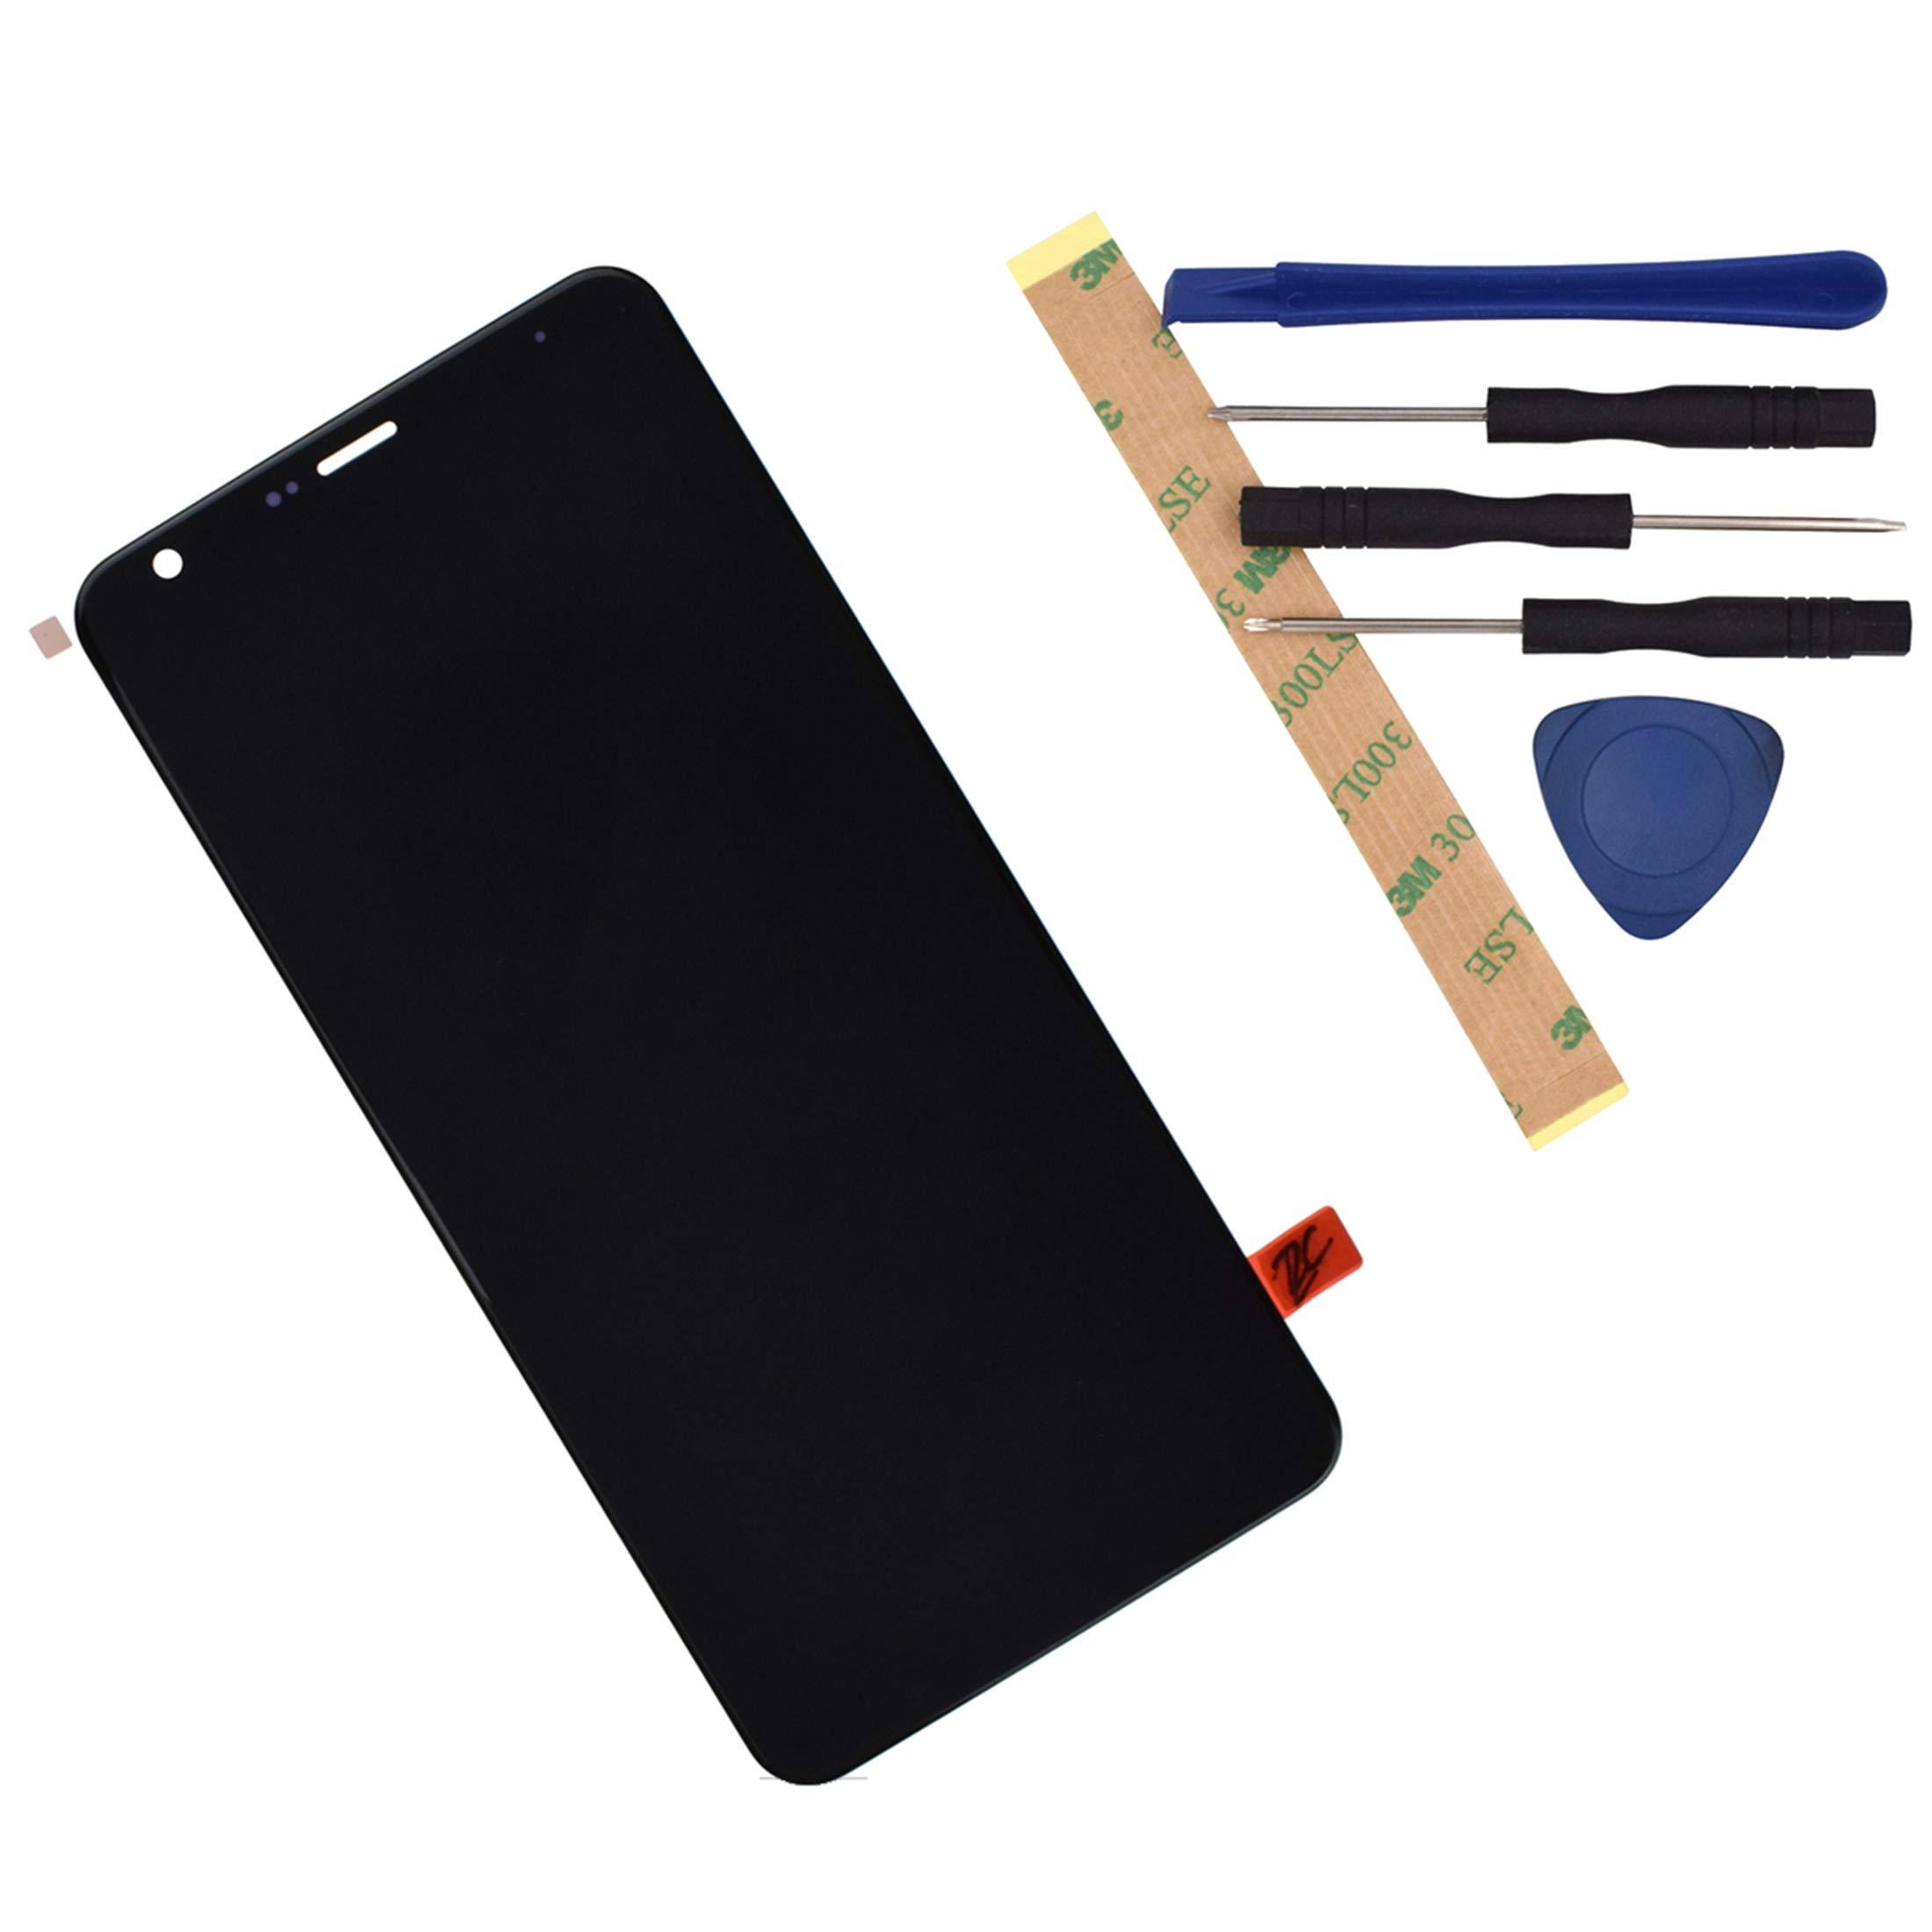 Modulo LCD Negro para LG Q7 2018 LM-Q610 With Frame Adhesive